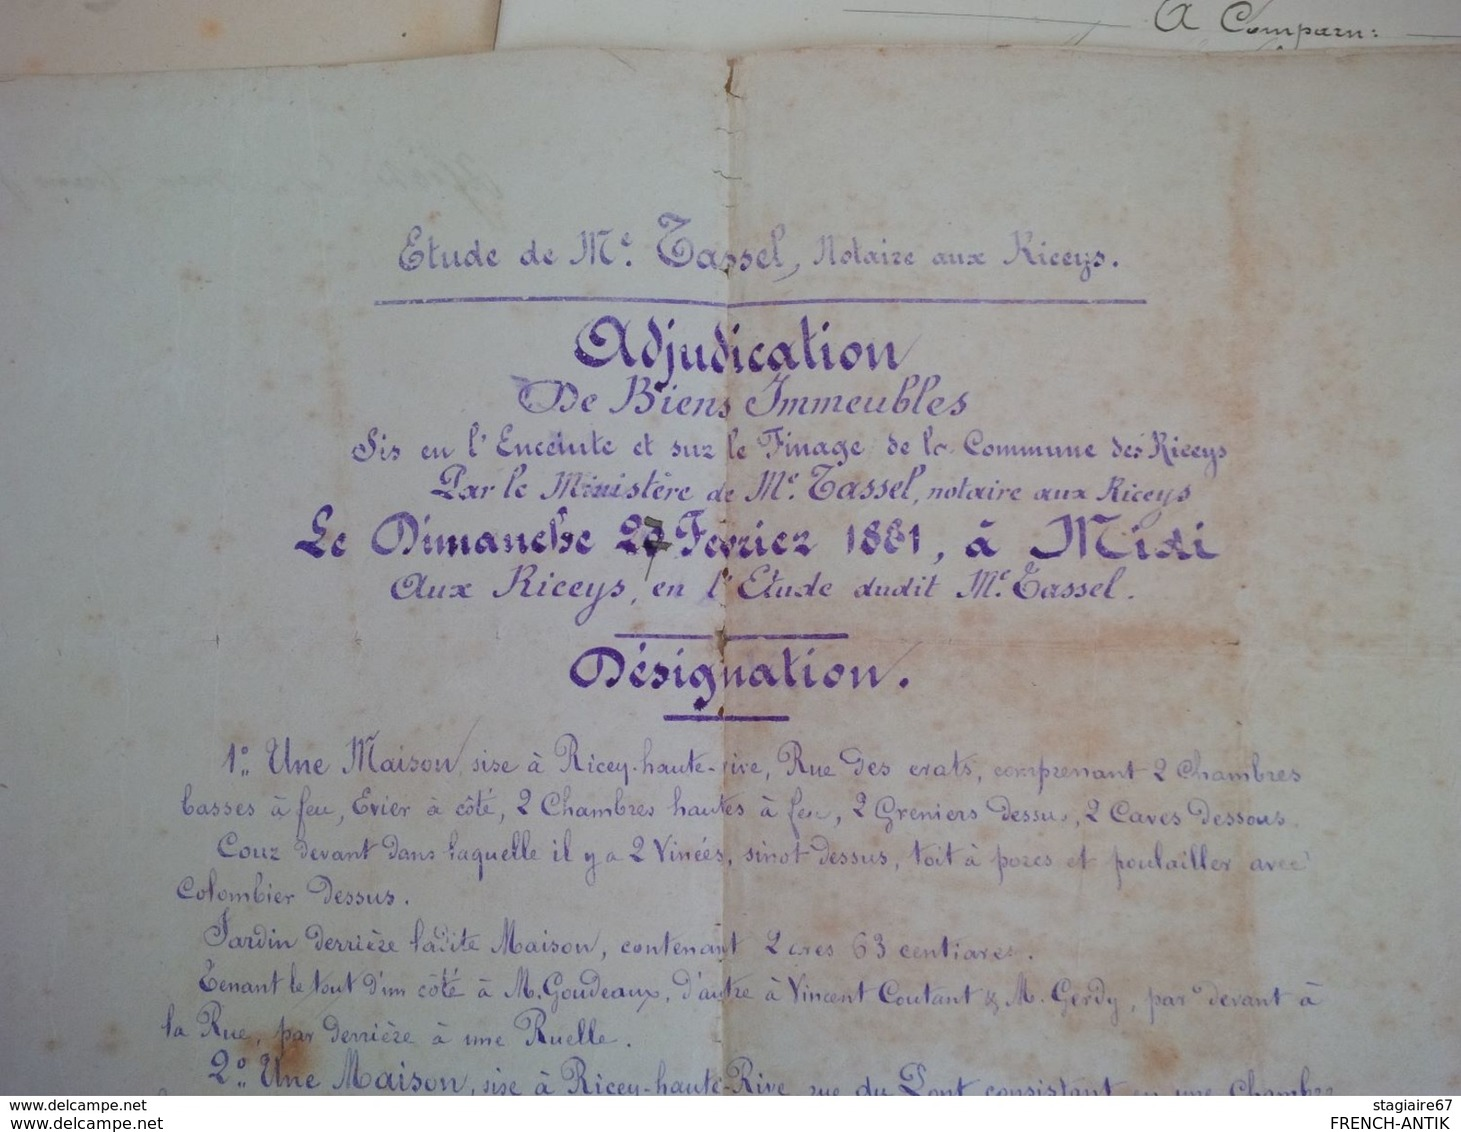 LES RICEYS AUBE ADJUDICATION MAISON FAMILLE GERARD TRANCHANT ADJUGE A EMILE FARINET MILLOT VIGNERON AUX RICEYS 1881 - Vecchi Documenti